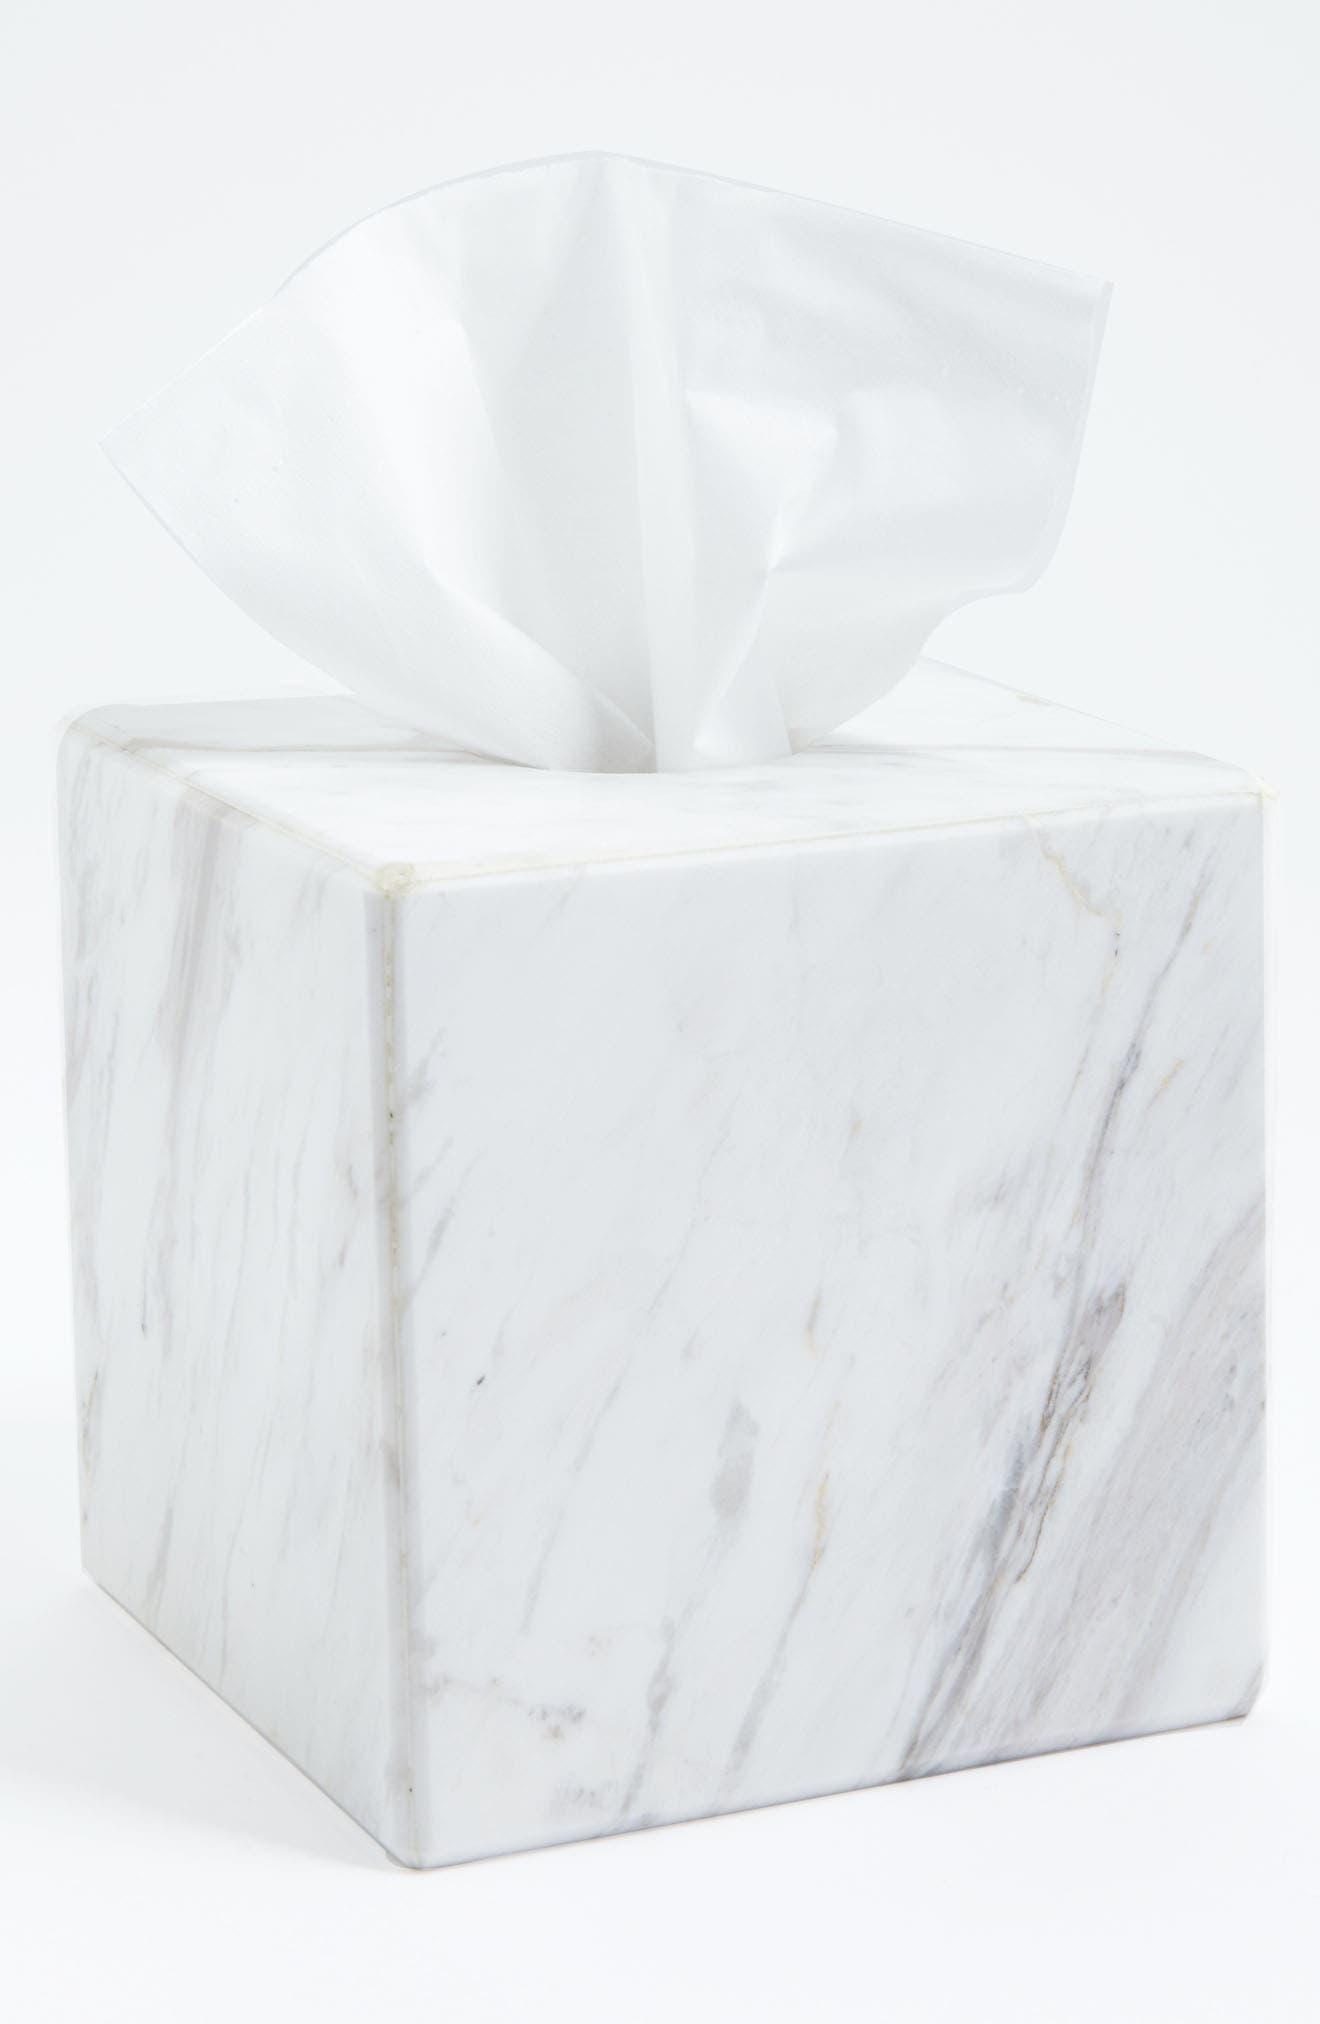 Studio 'Luna' White Marble Tissue Cover,                             Main thumbnail 1, color,                             White